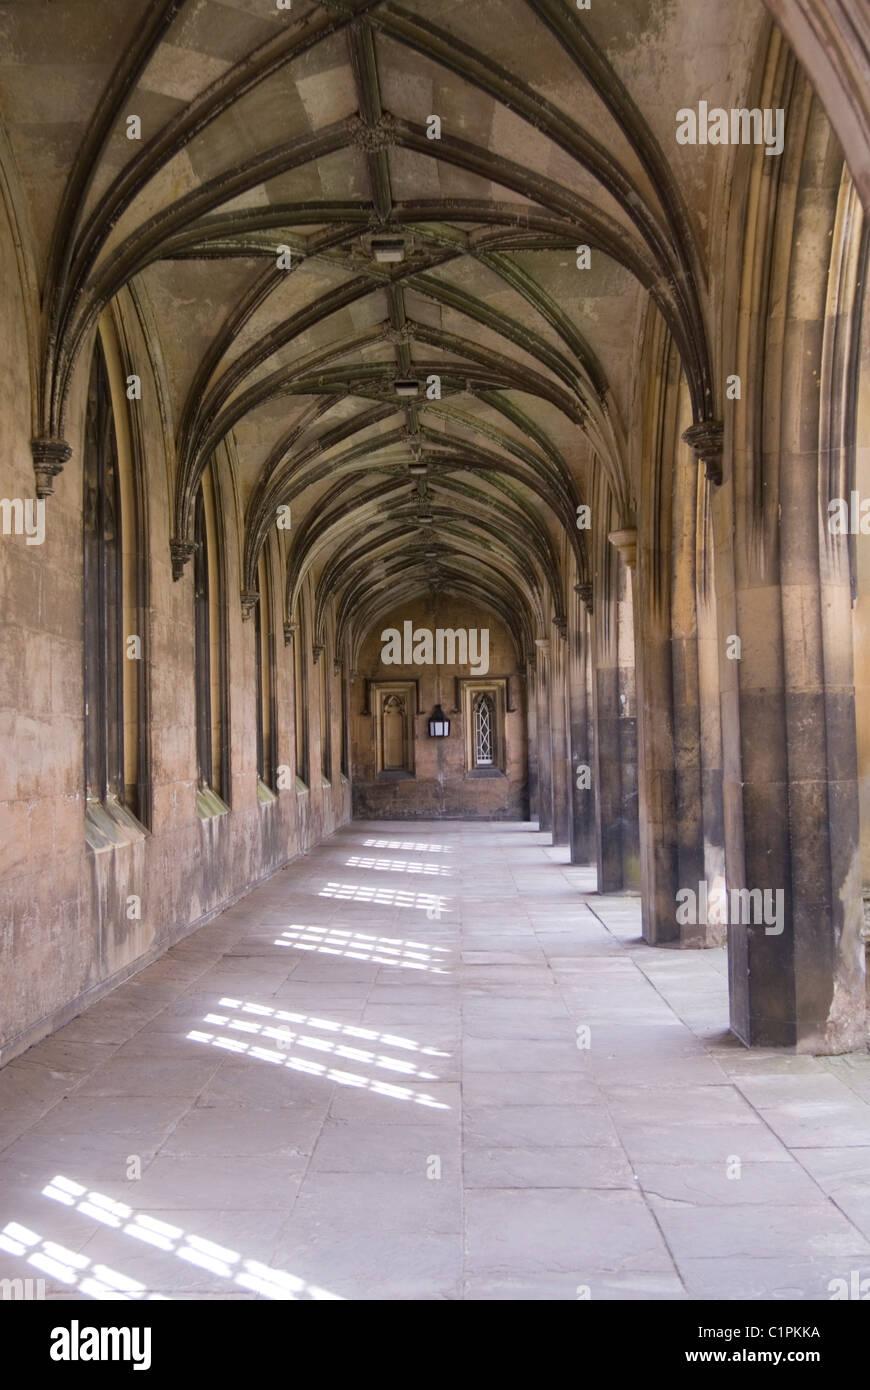 England, Cambridge, St. John's College cloisters - Stock Image